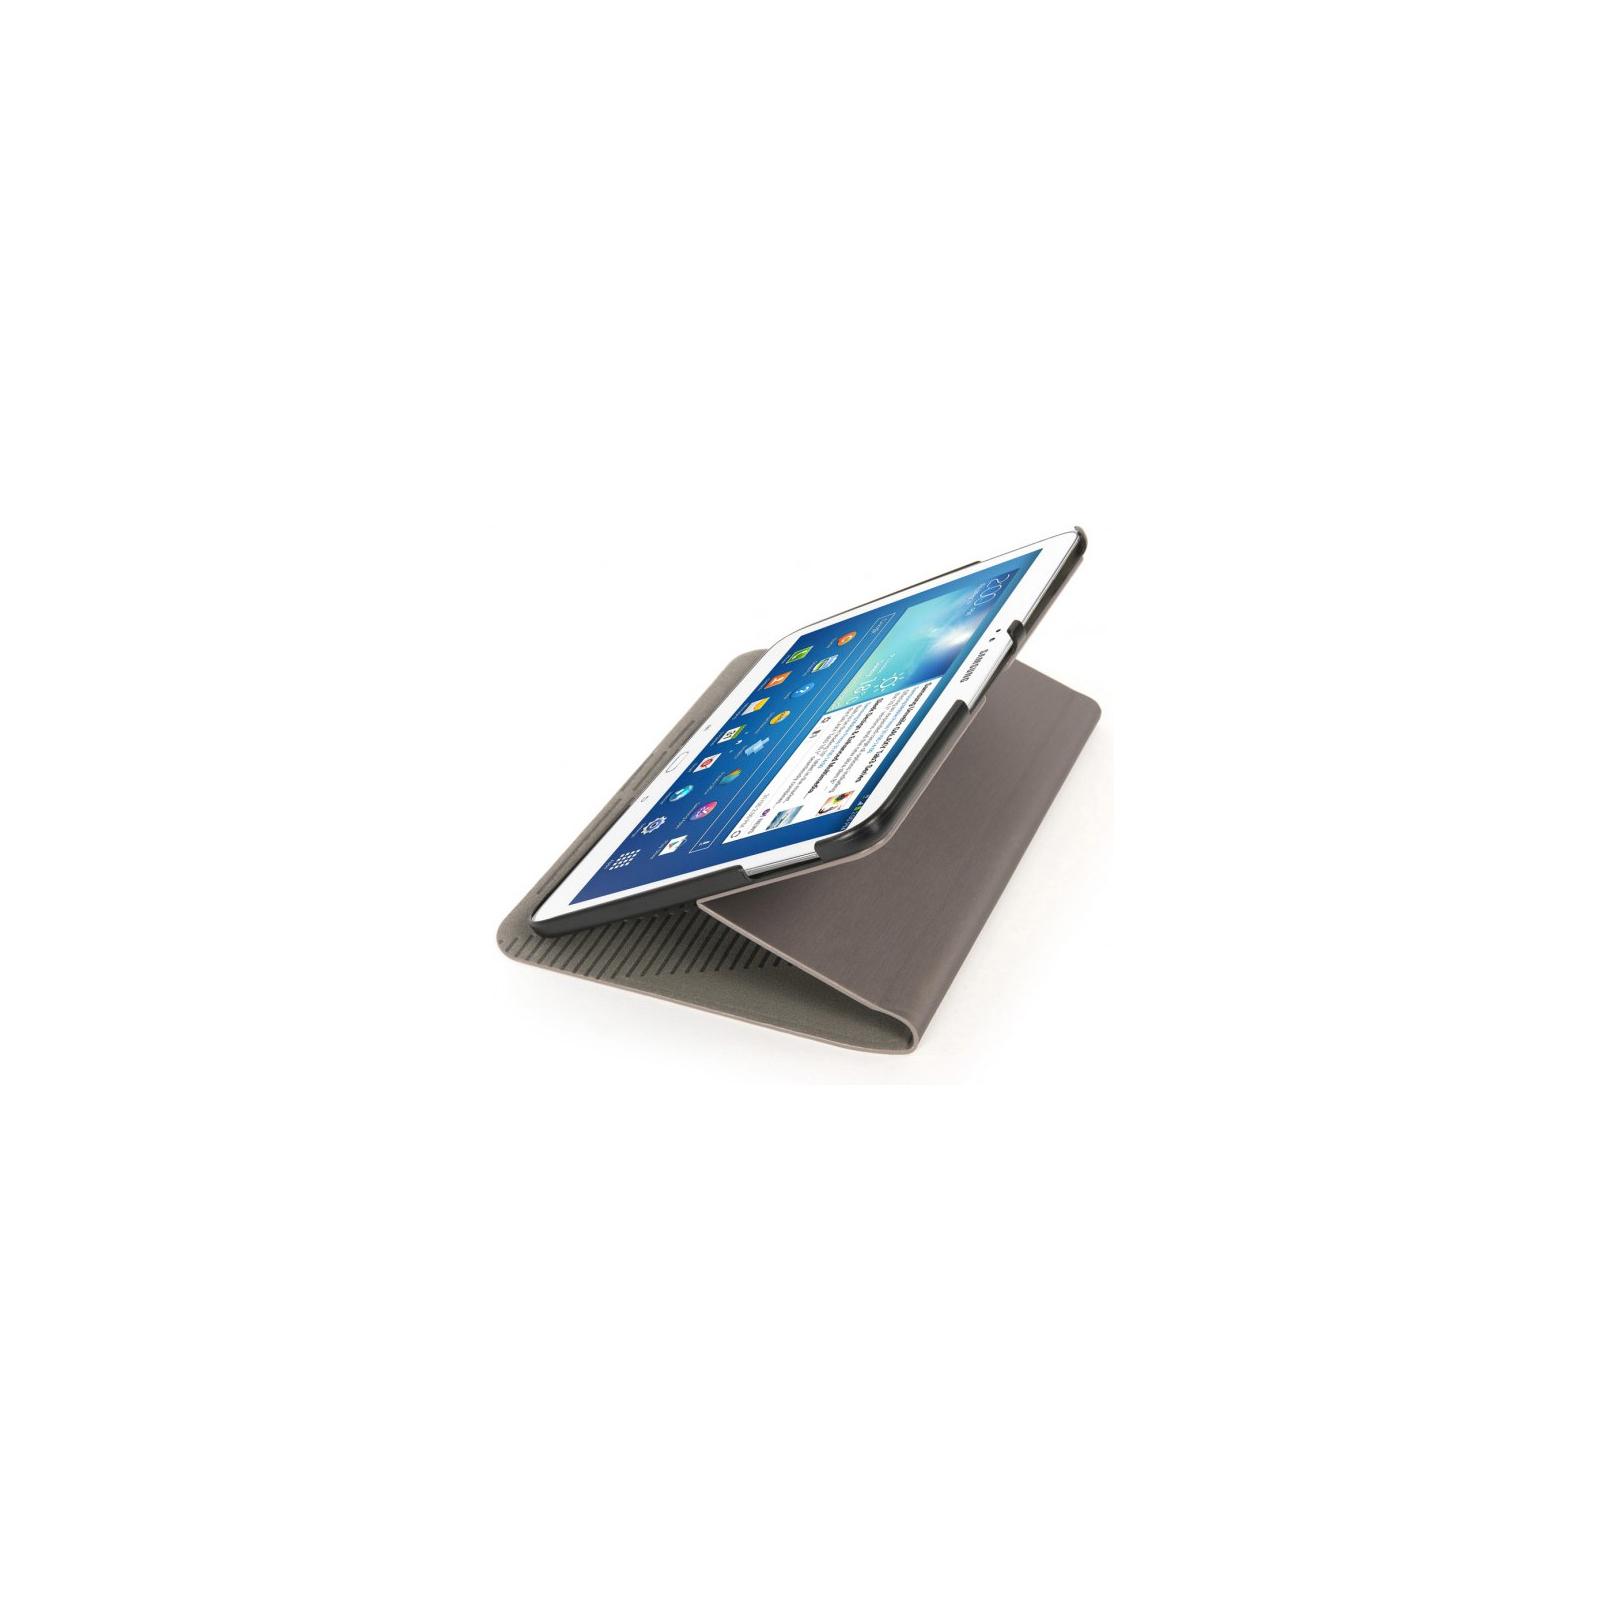 Чехол для планшета Tucano Galaxy Tab3 10.1 Macro (TAB-MS310-G) изображение 6